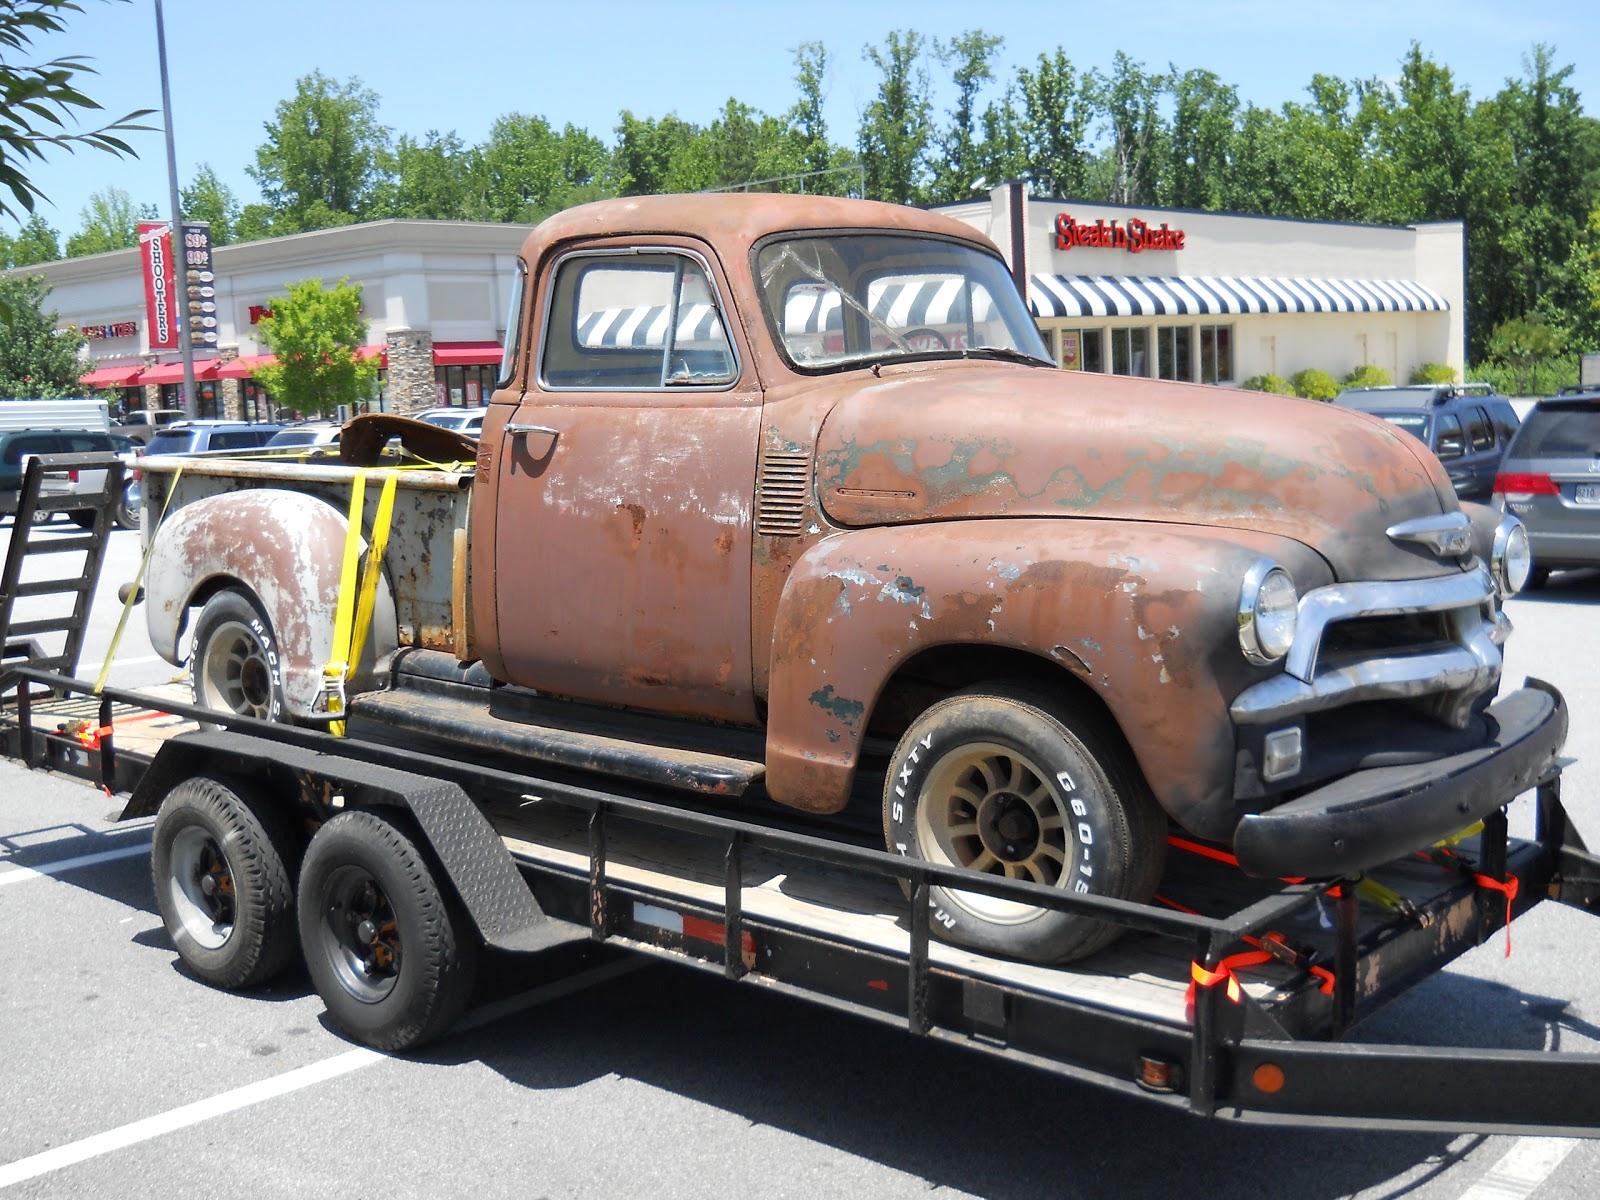 1947 chevy truck for sale on craigslist autos post. Black Bedroom Furniture Sets. Home Design Ideas